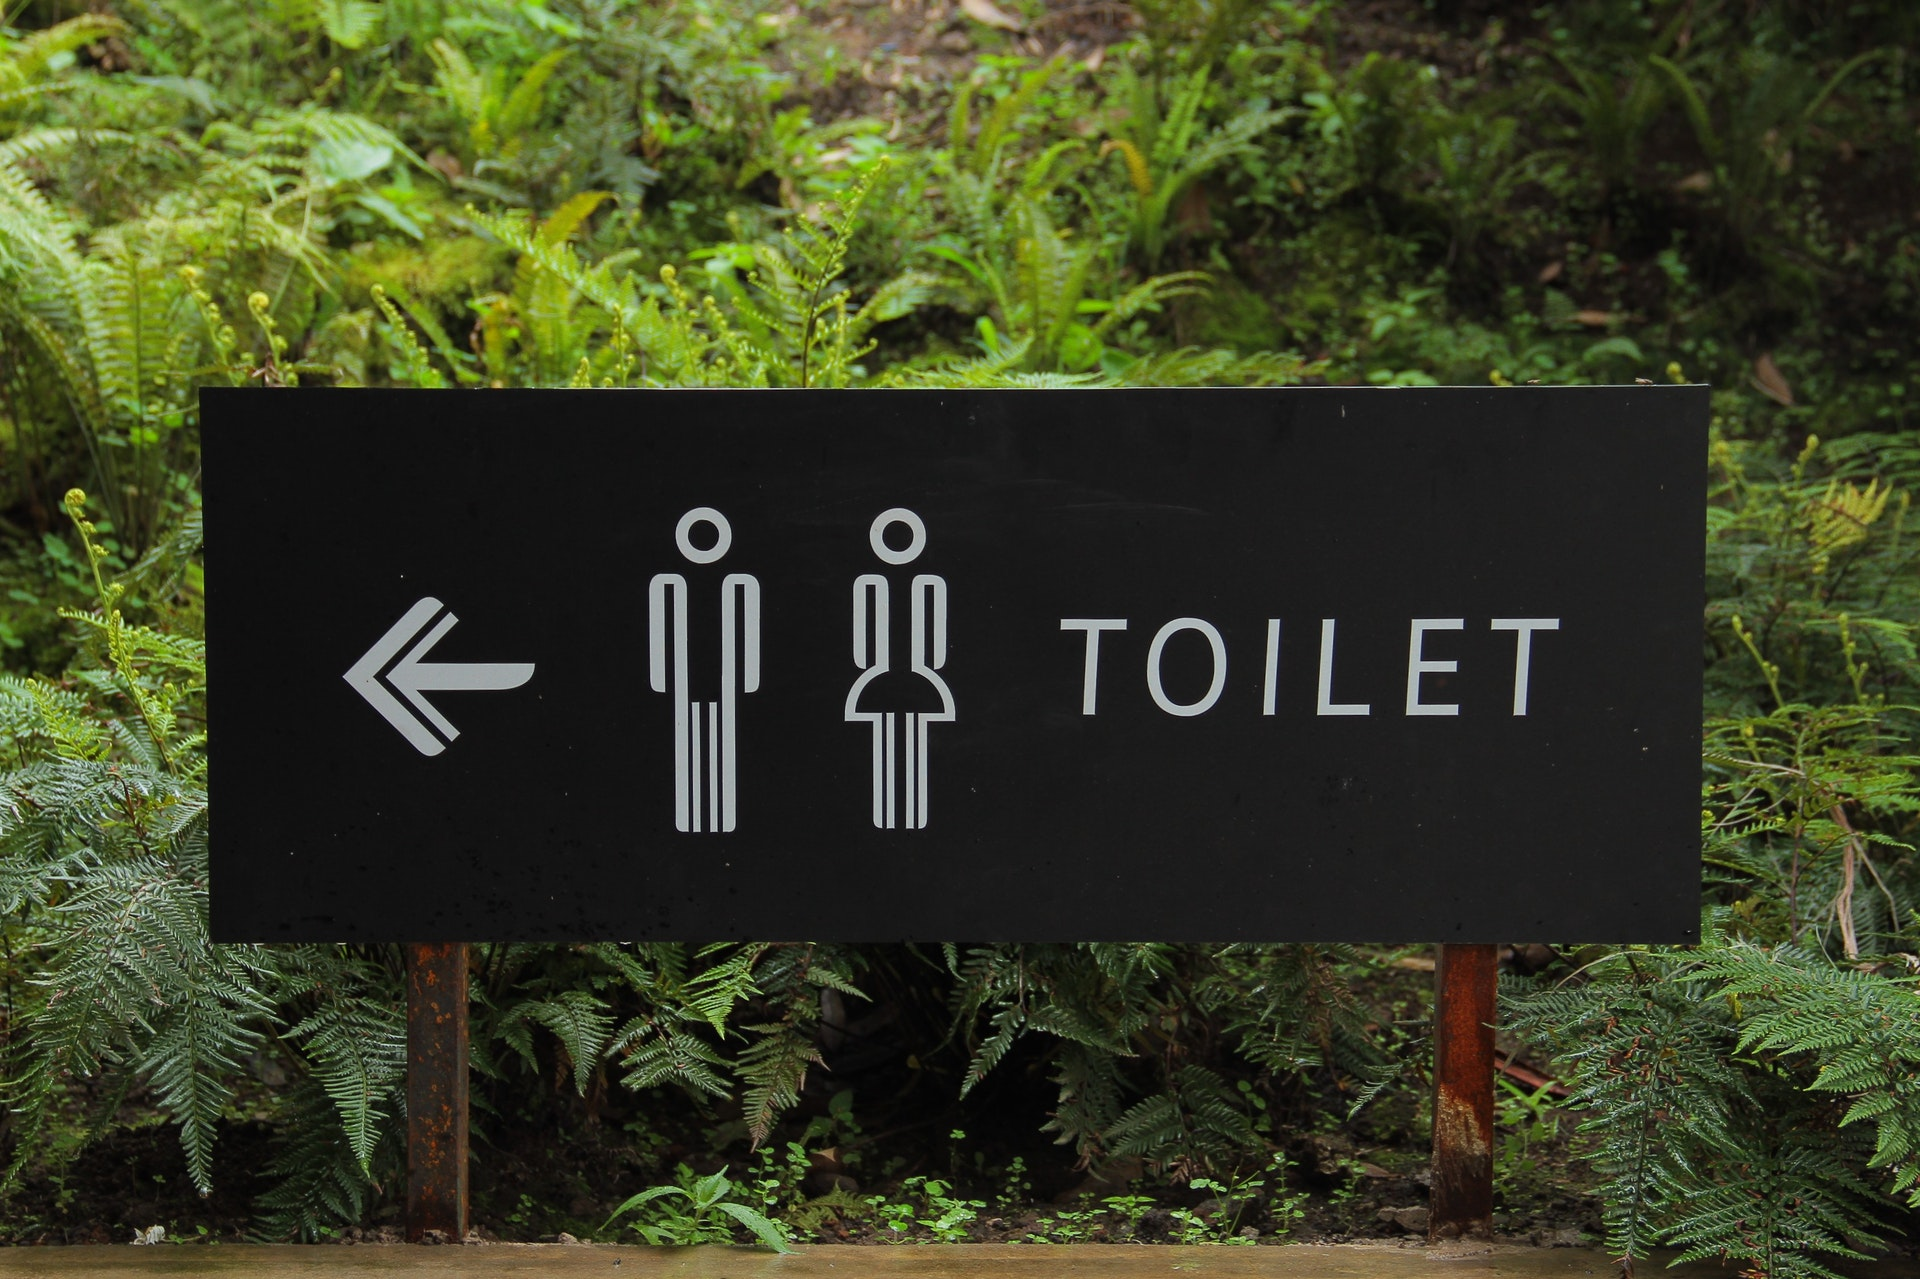 public restroom survival kit - public toilet kit - public restroom necessities